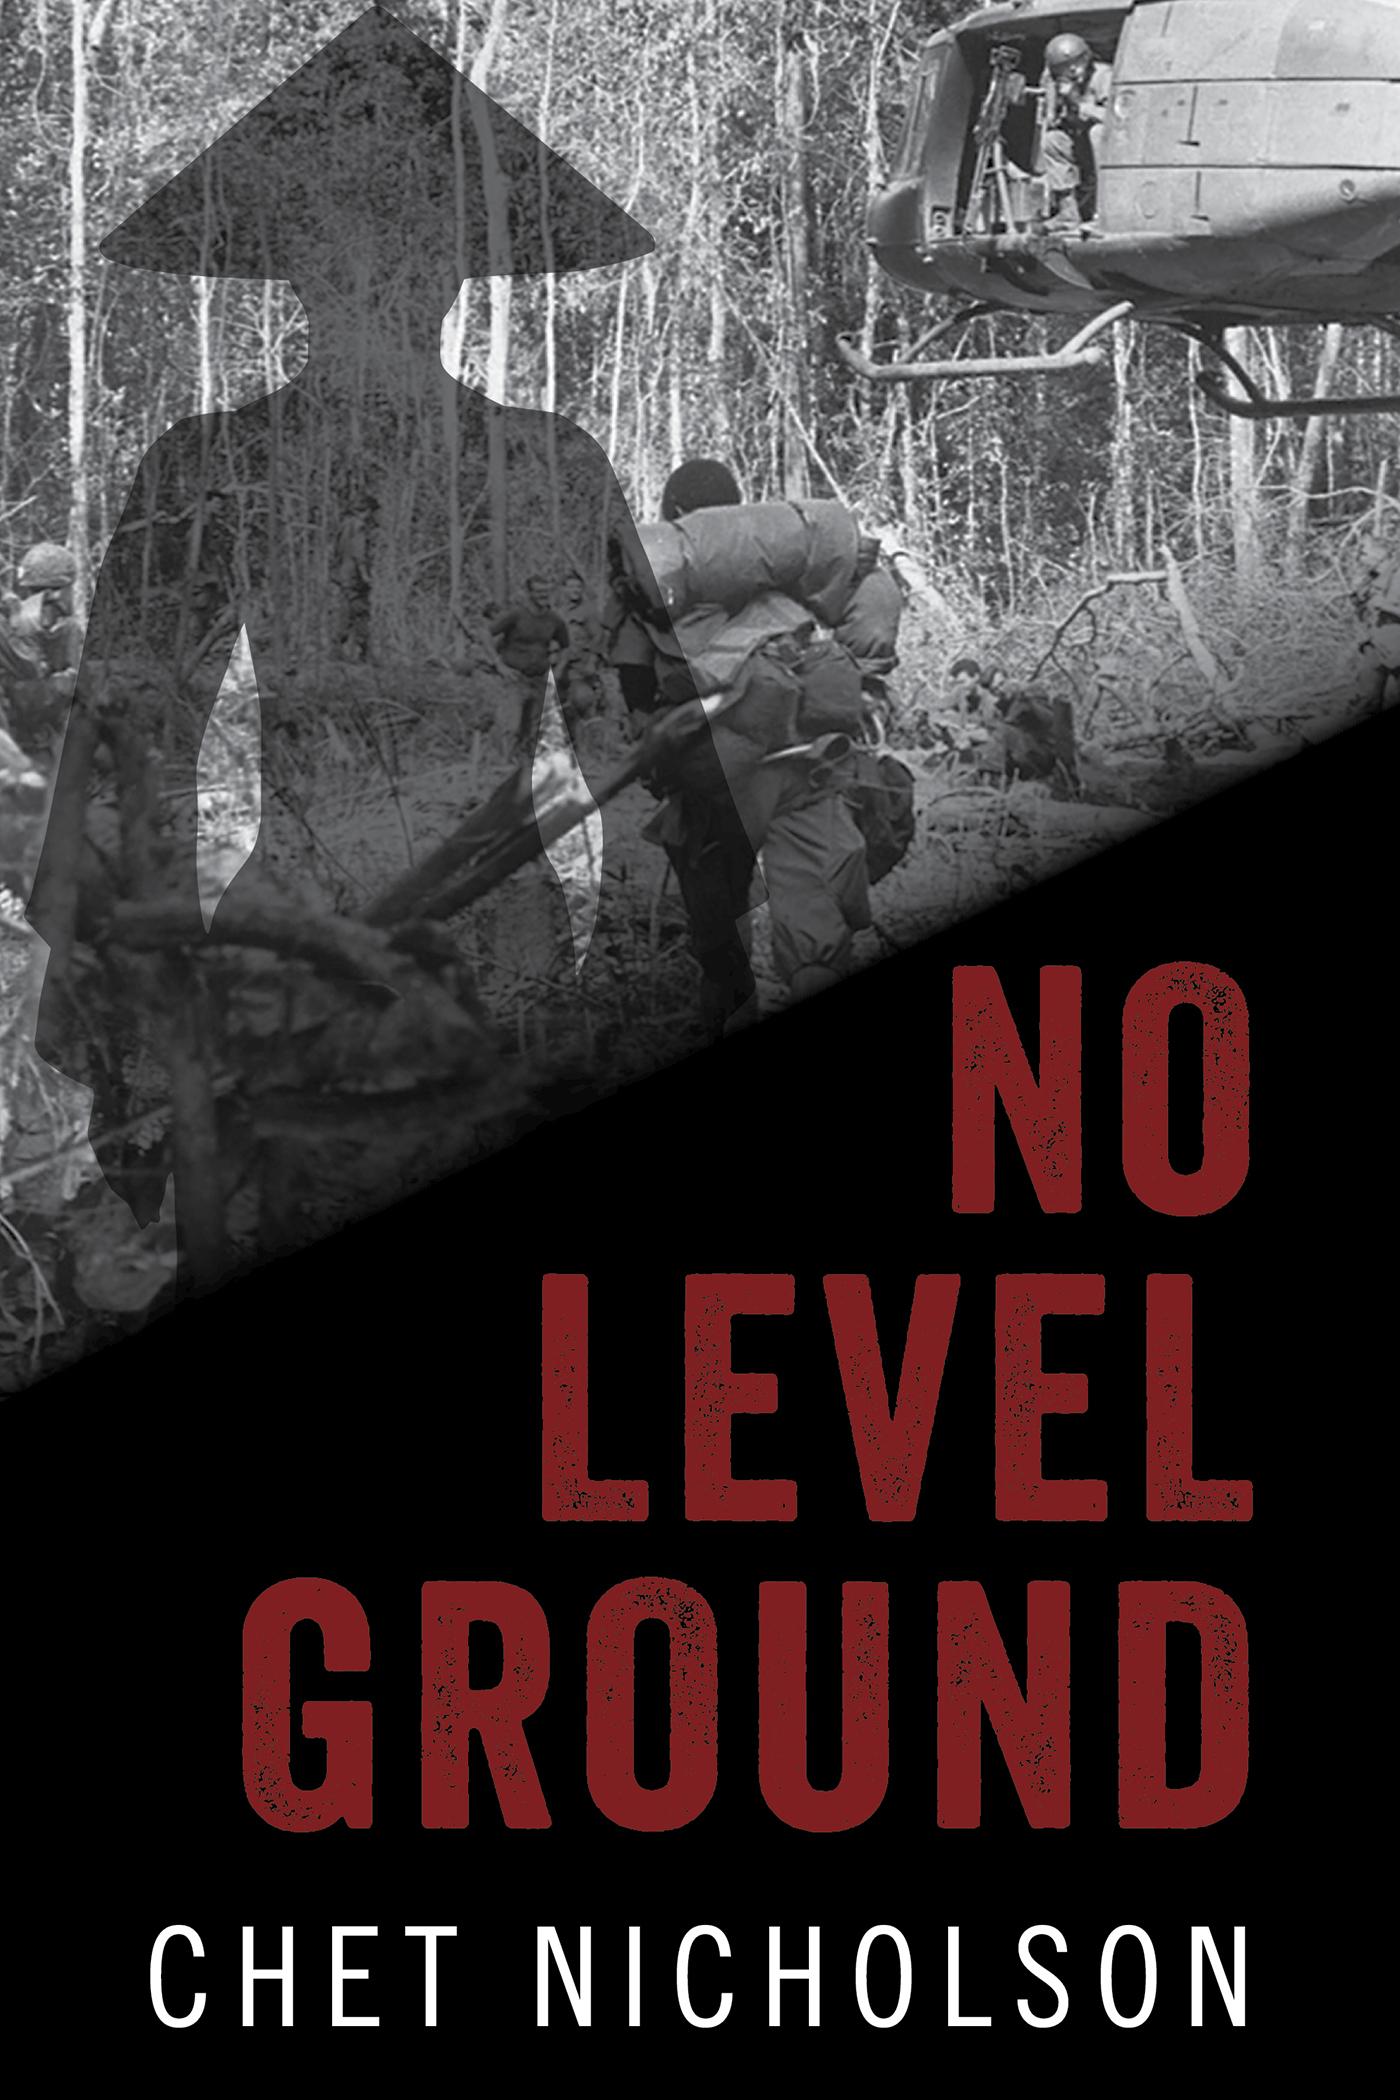 No Level Ground Chet Nicholson